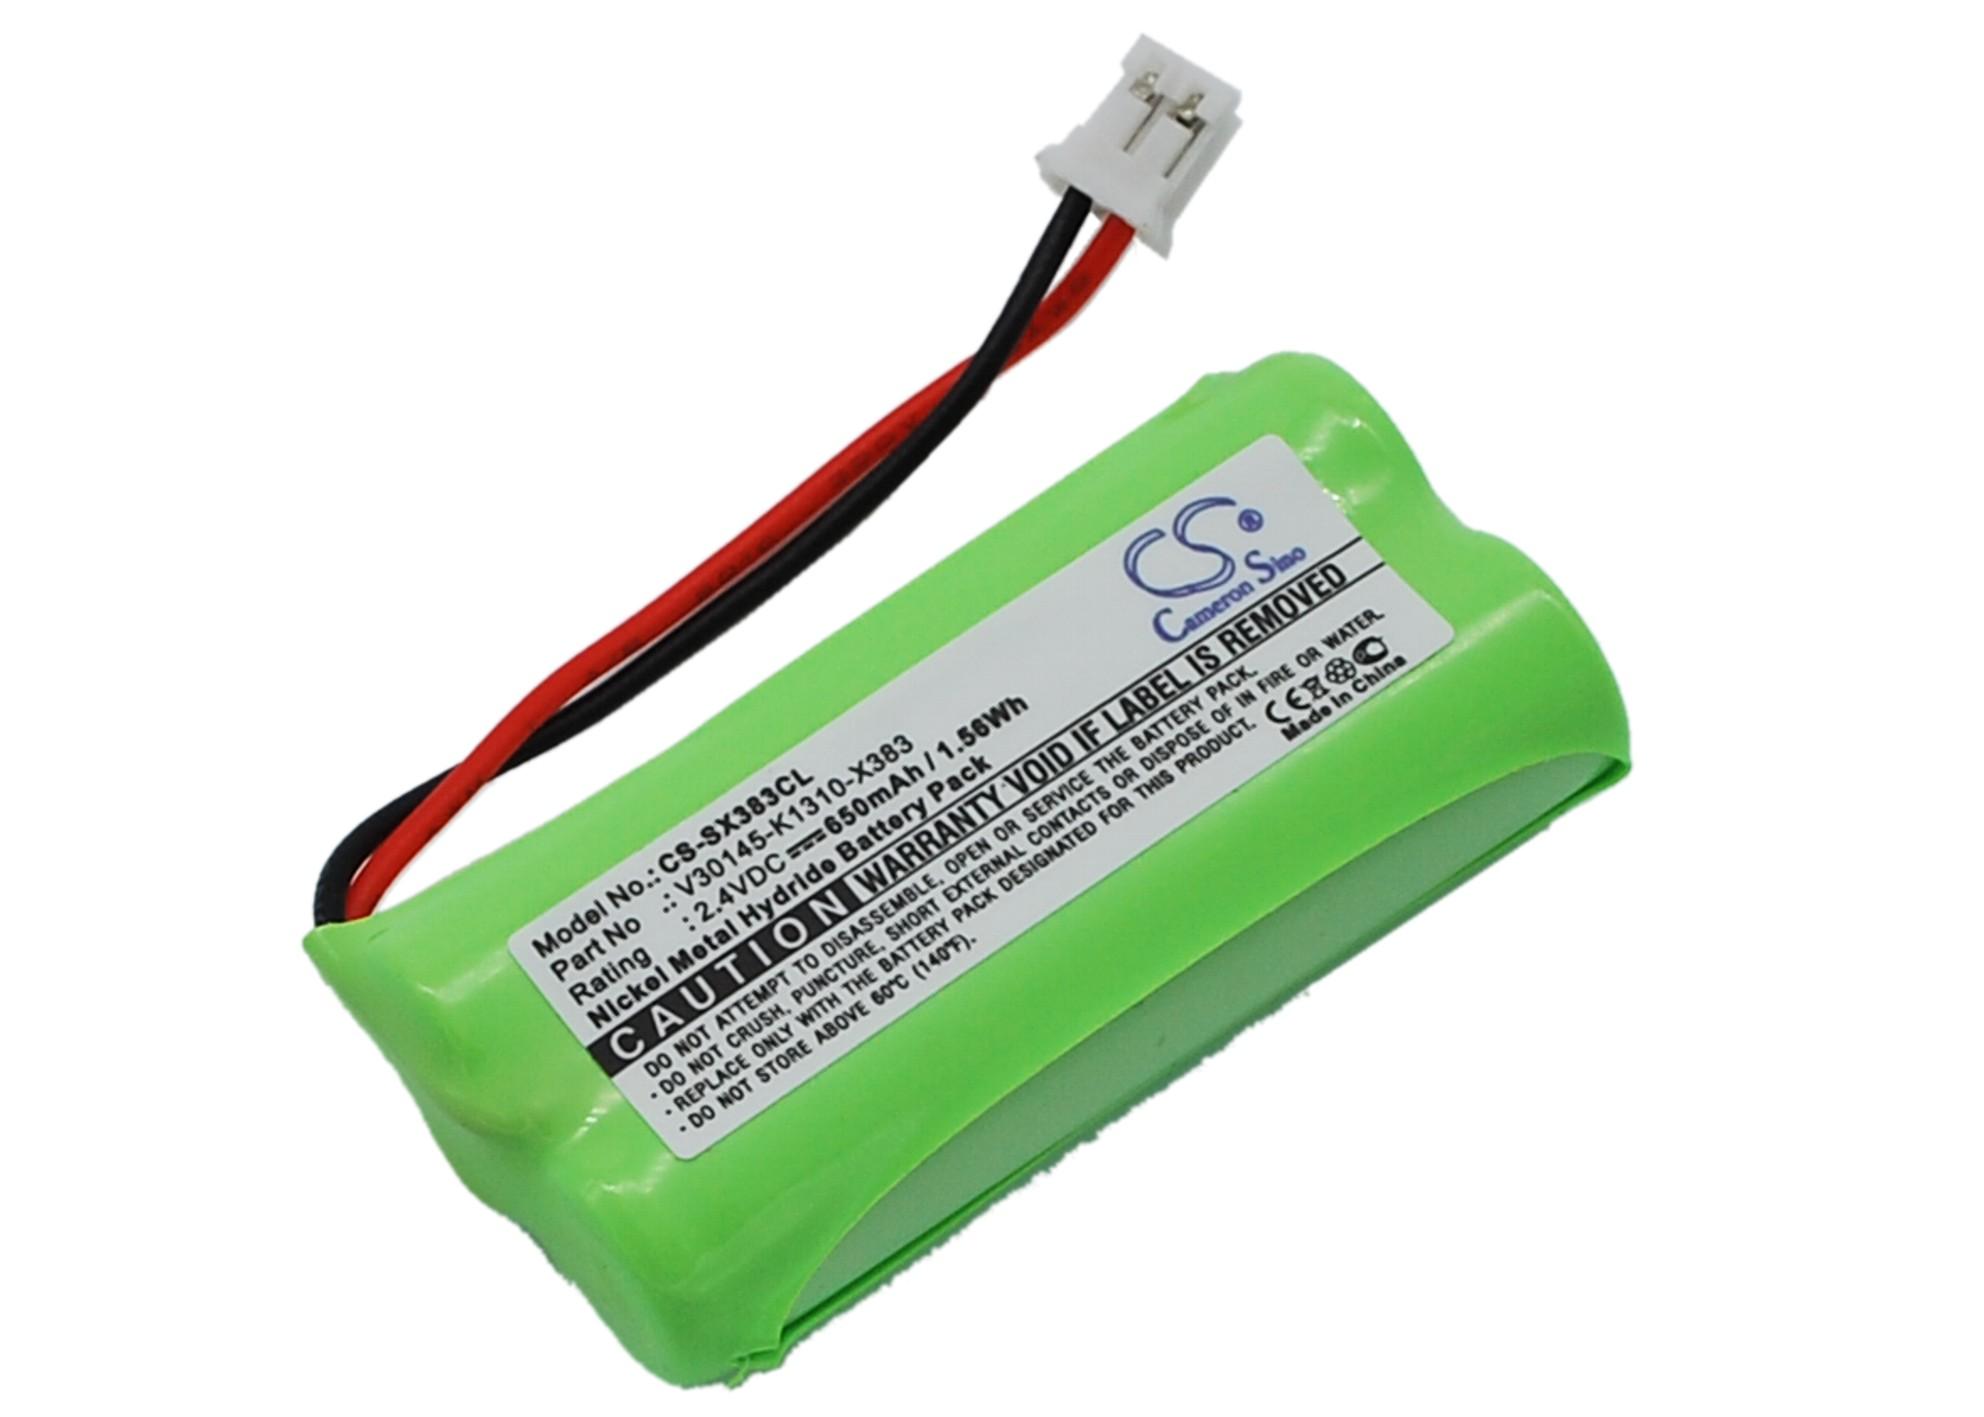 Cameron Sino baterie do bezdrátových telefonů za V30145-K1310-X359 2.4V Ni-MH 650mAh černá - neoriginální